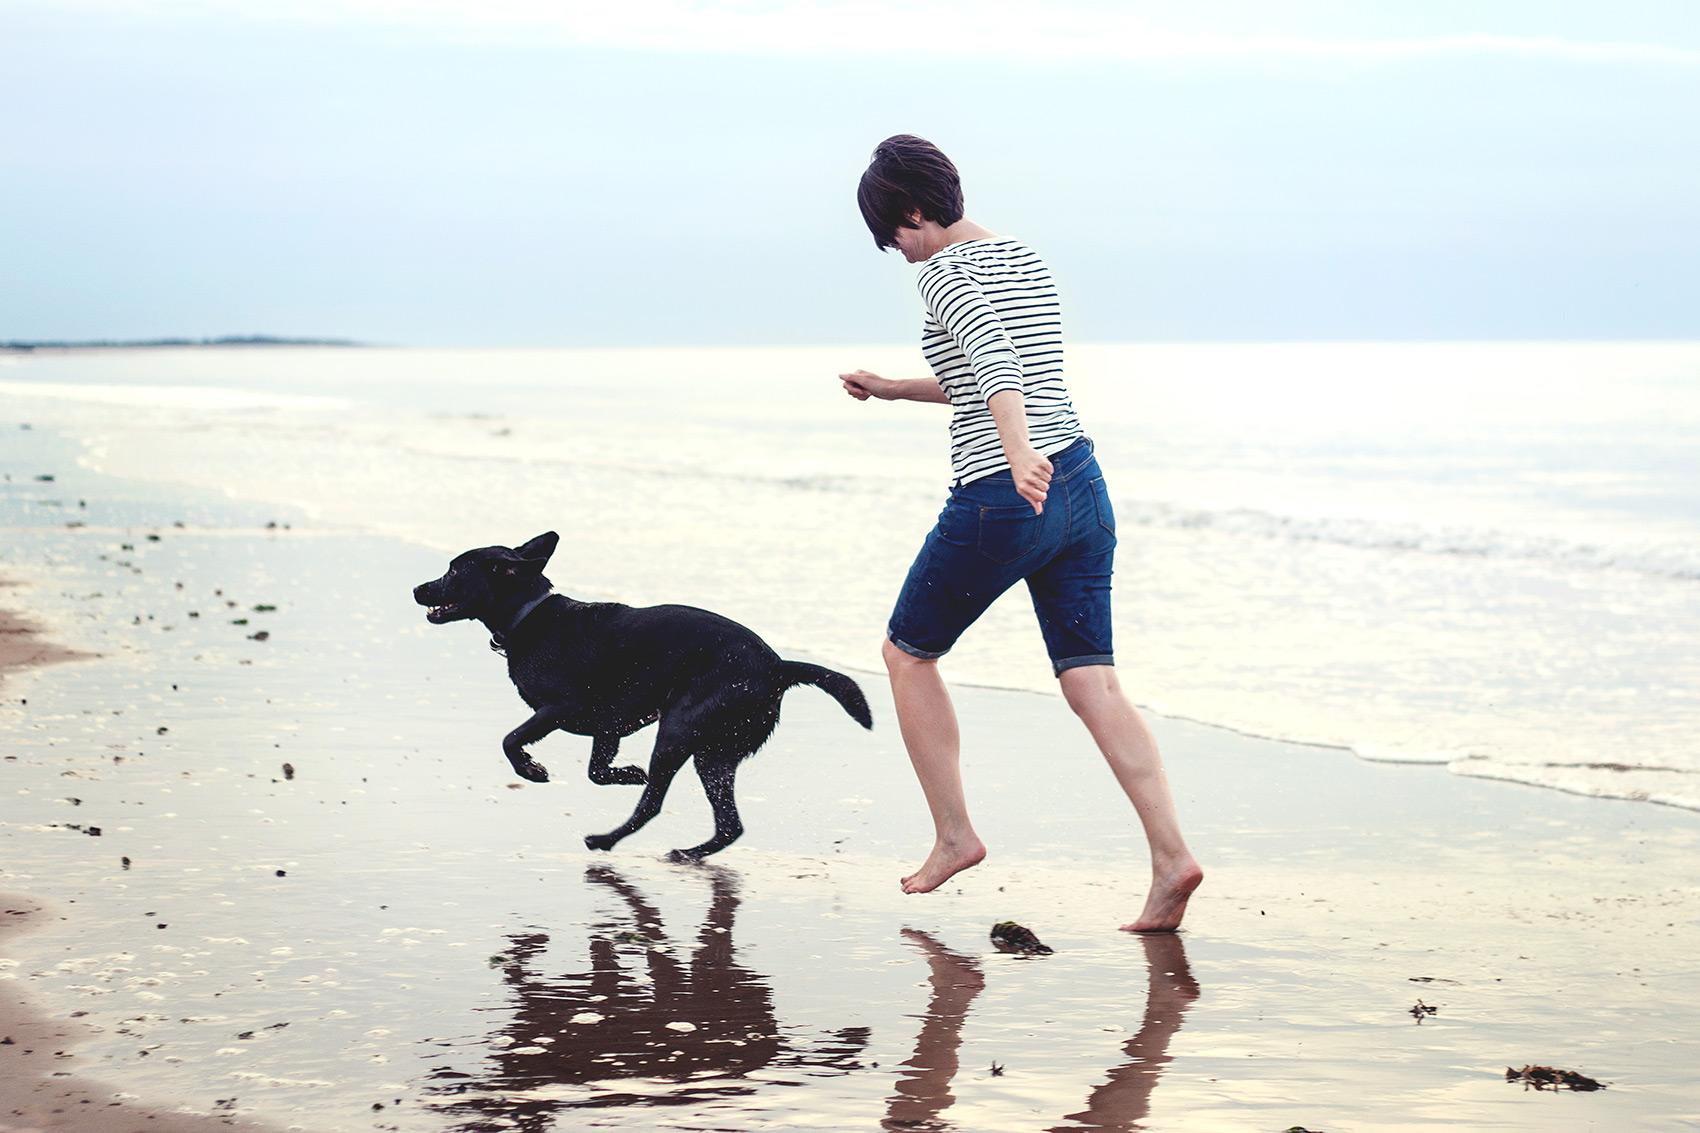 © Esther Wild Photographer, Family Beach Photography Session, Brancaster, Norfolk, UK.